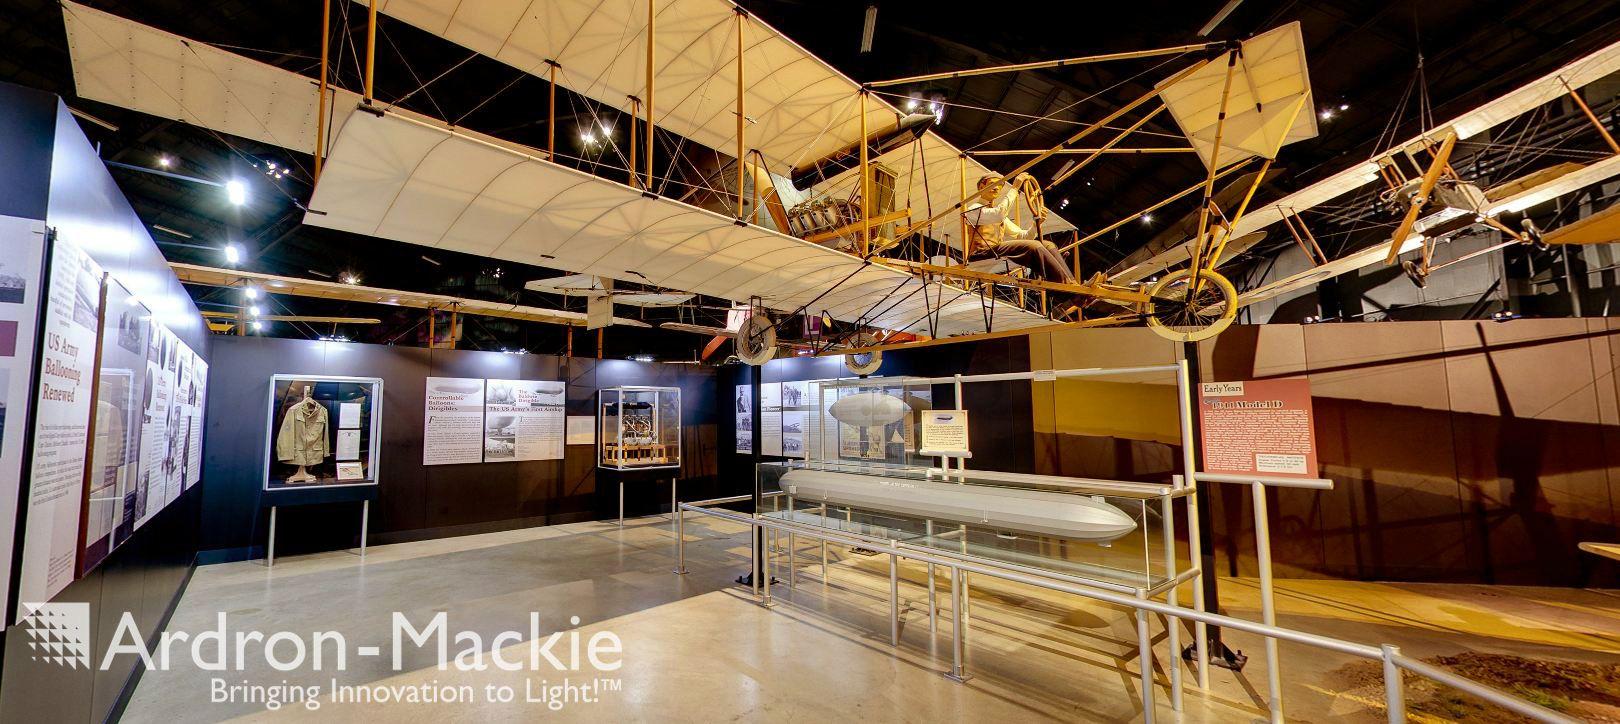 Ardronmackie usaf museum in dayton ohio cove